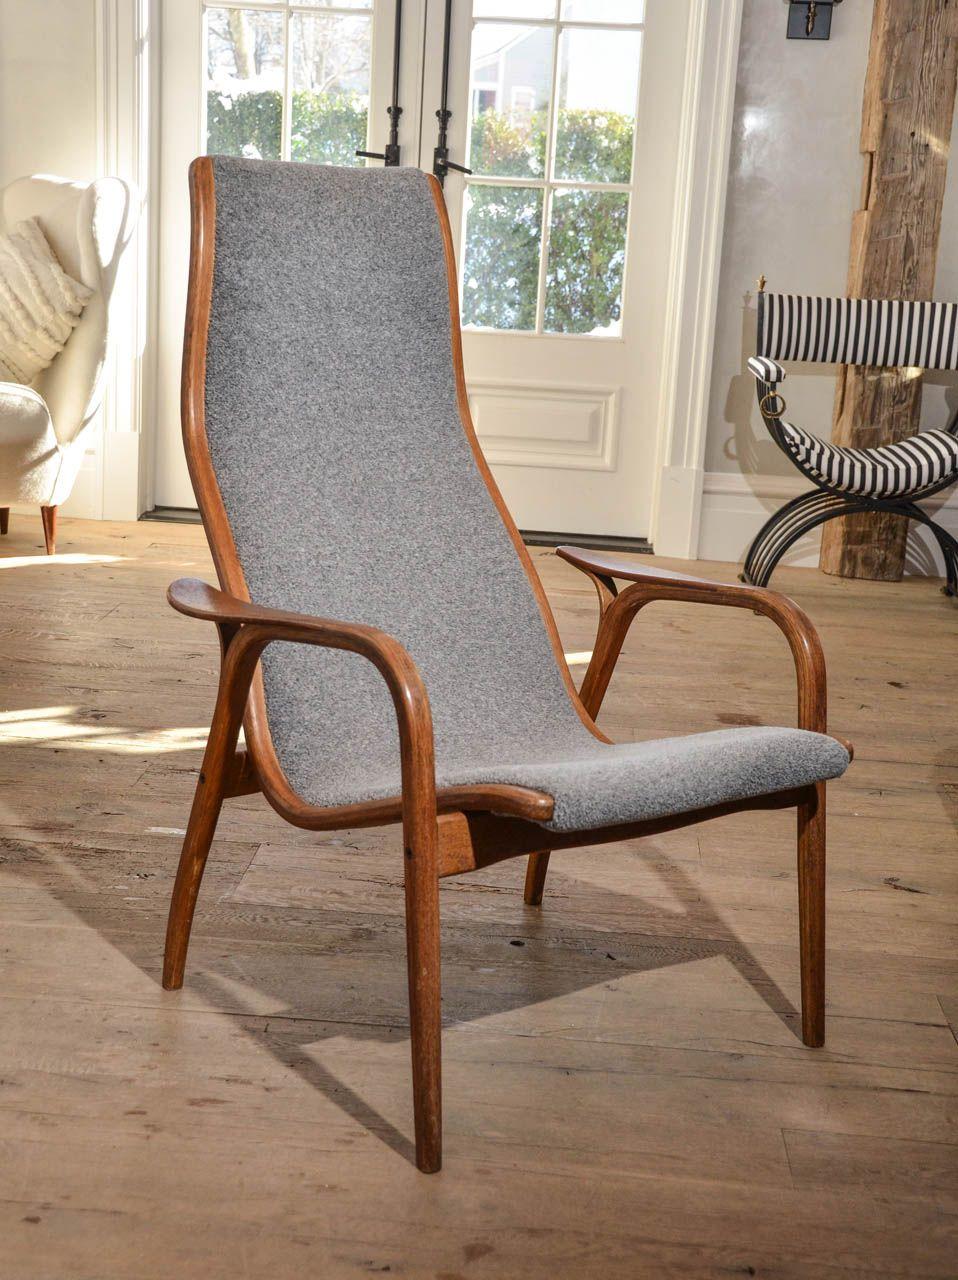 Pair Of Mid Century Swedish Lamino Highback Chairs By Yngwe Eckstroem Chair Scandinavian Furniture Furniture Chair